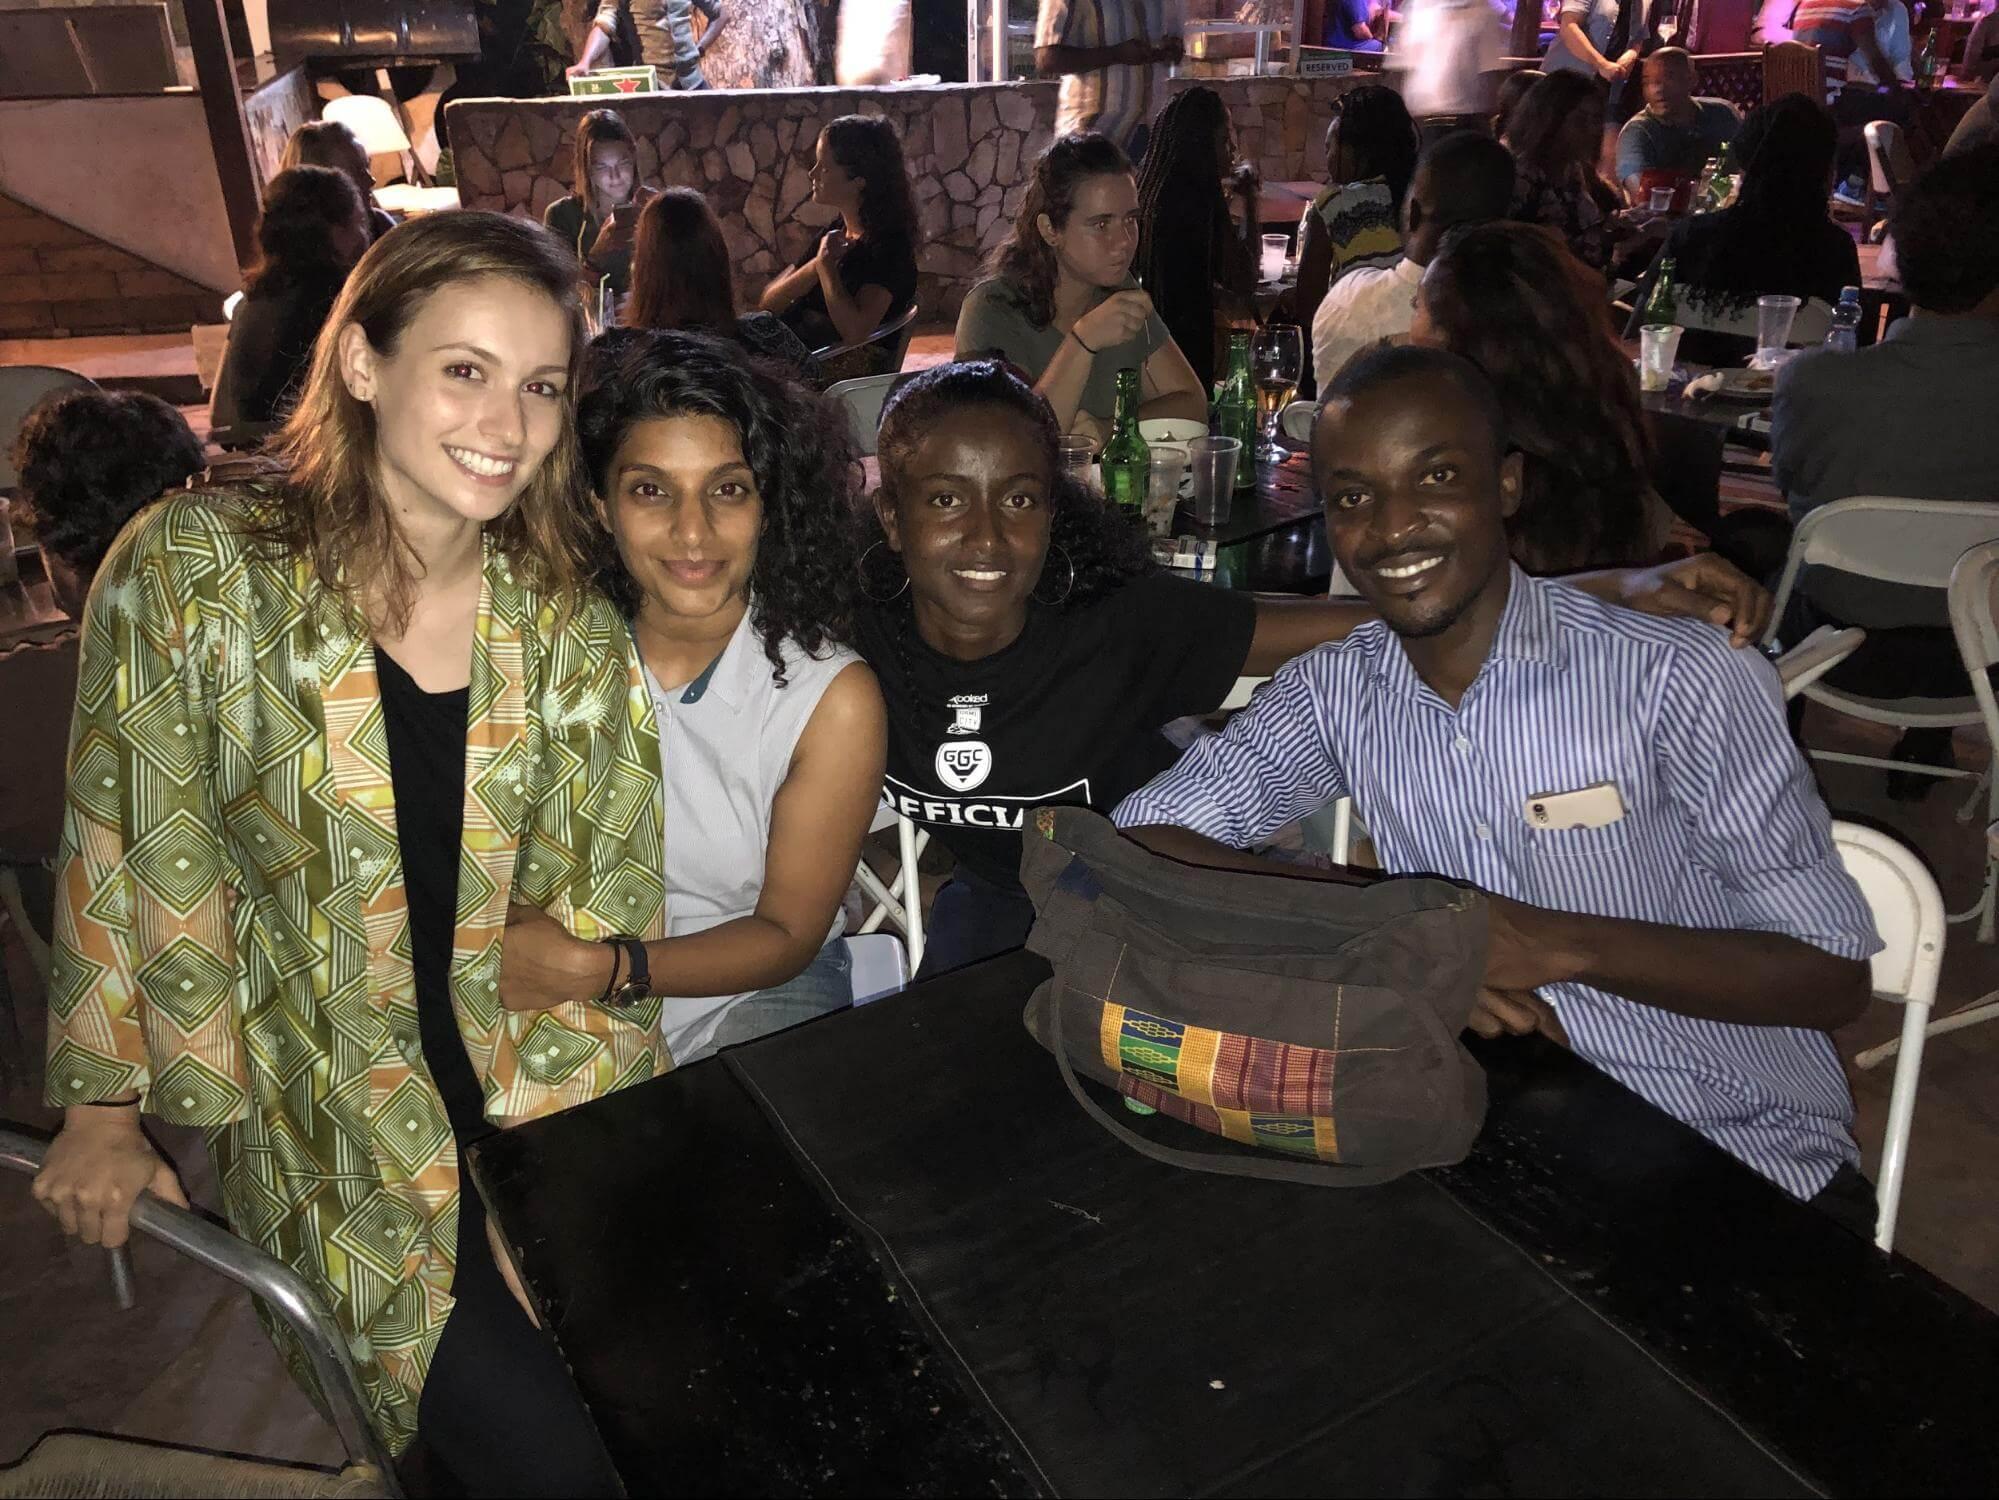 ESP internship stories: Laura in Accra Ghana 9